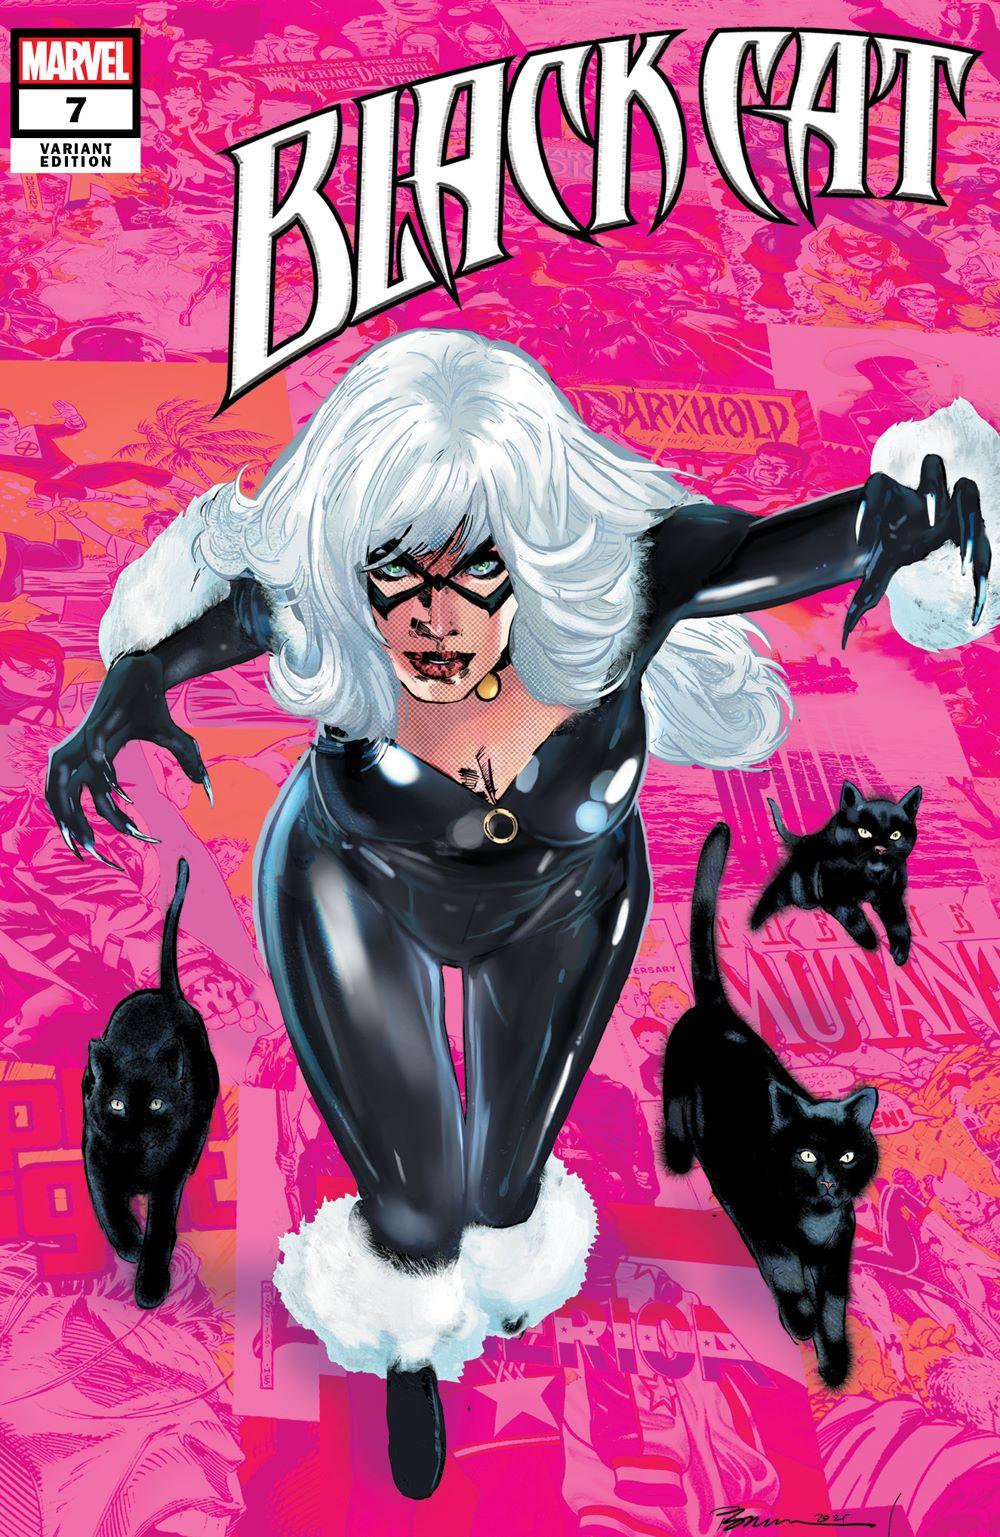 BLACKCAT2020007_Pride Marvel Comics reveals Black Cat Pride Month Variant cover